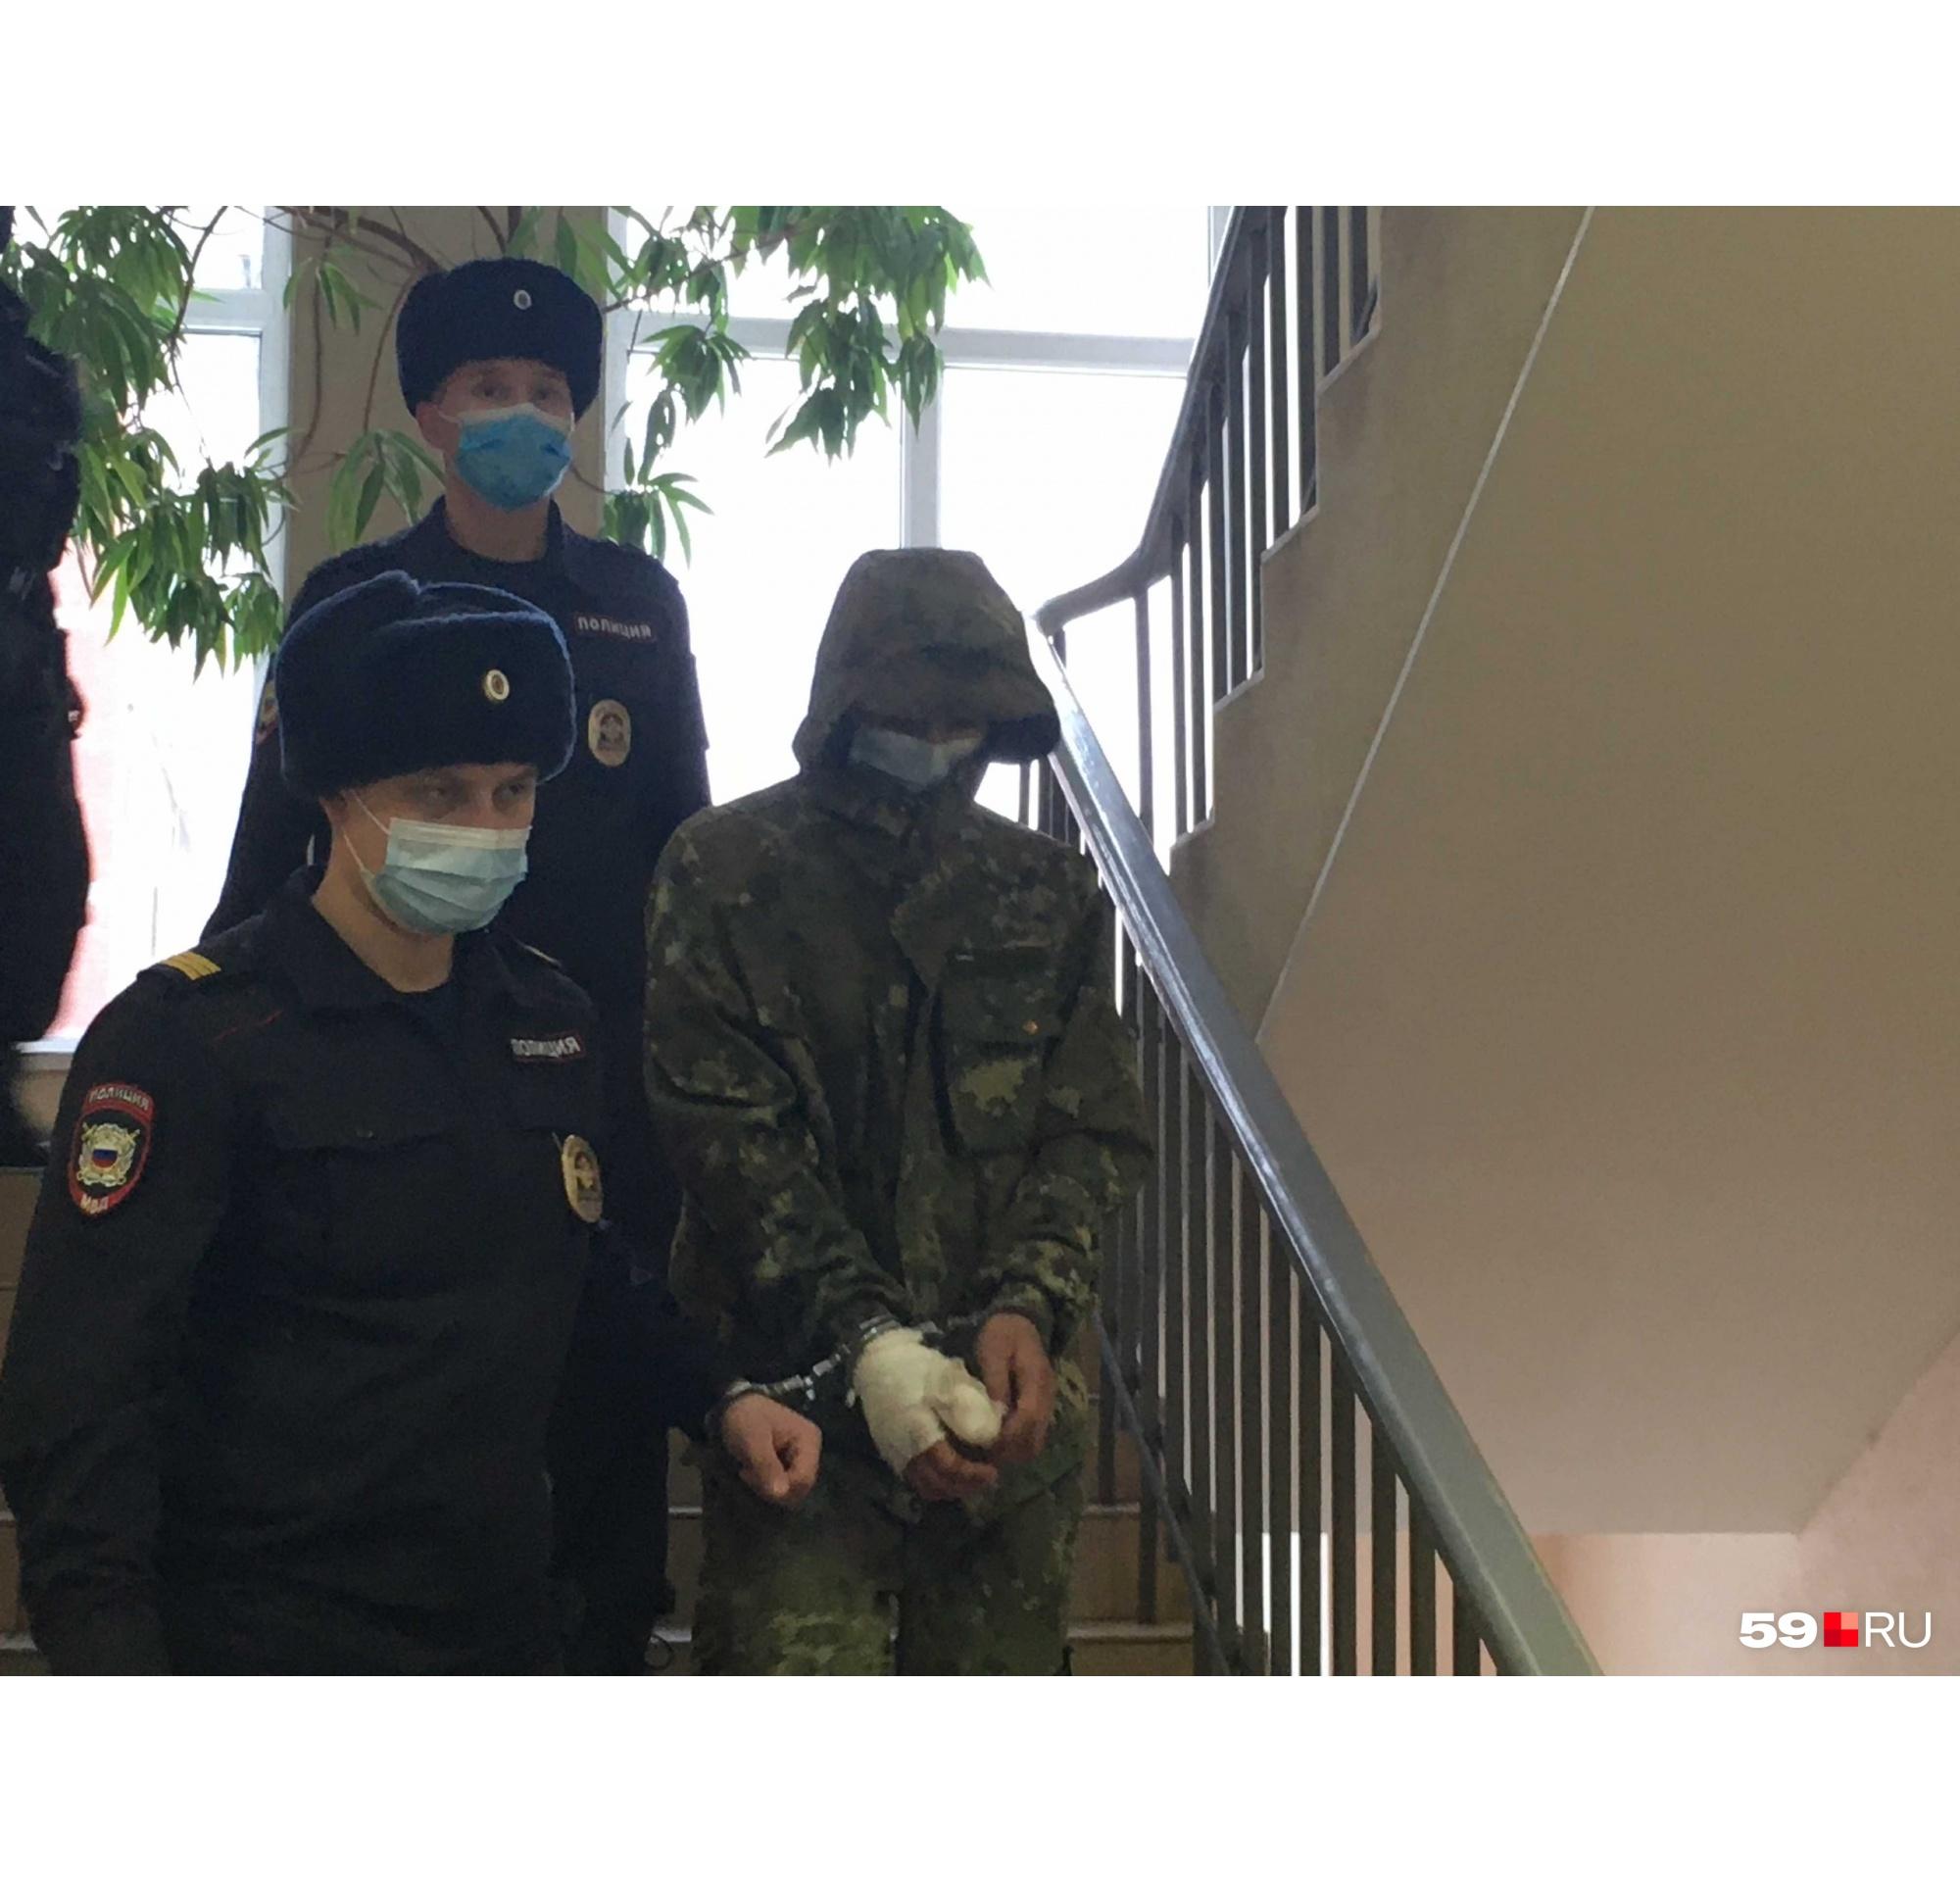 Подозреваемого ведут в зал суда